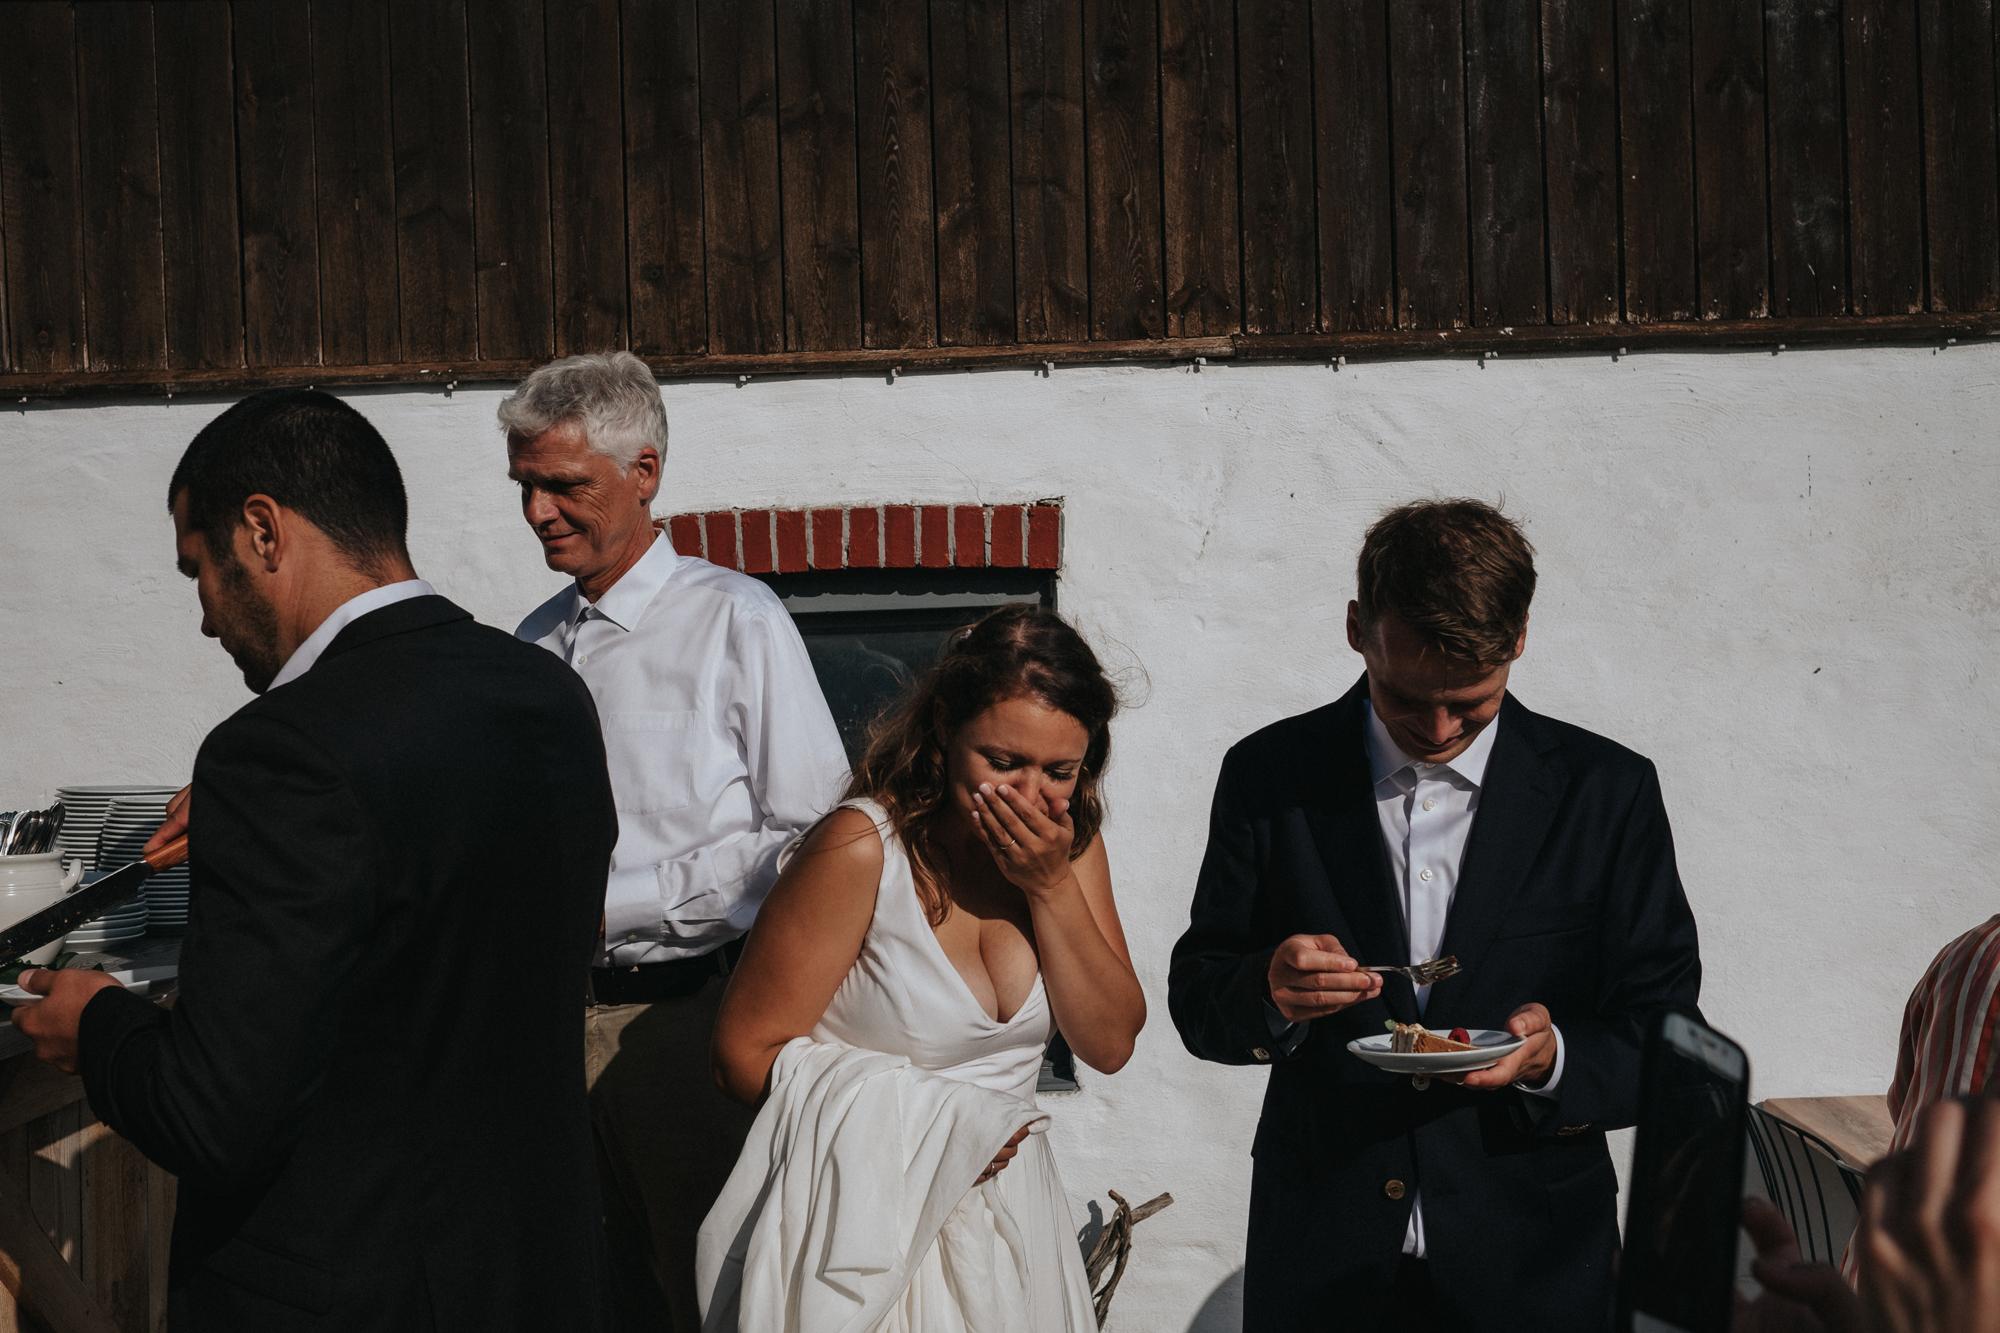 049-bröllop-gåsemora-gårdskrog-neas-fotografi.jpg